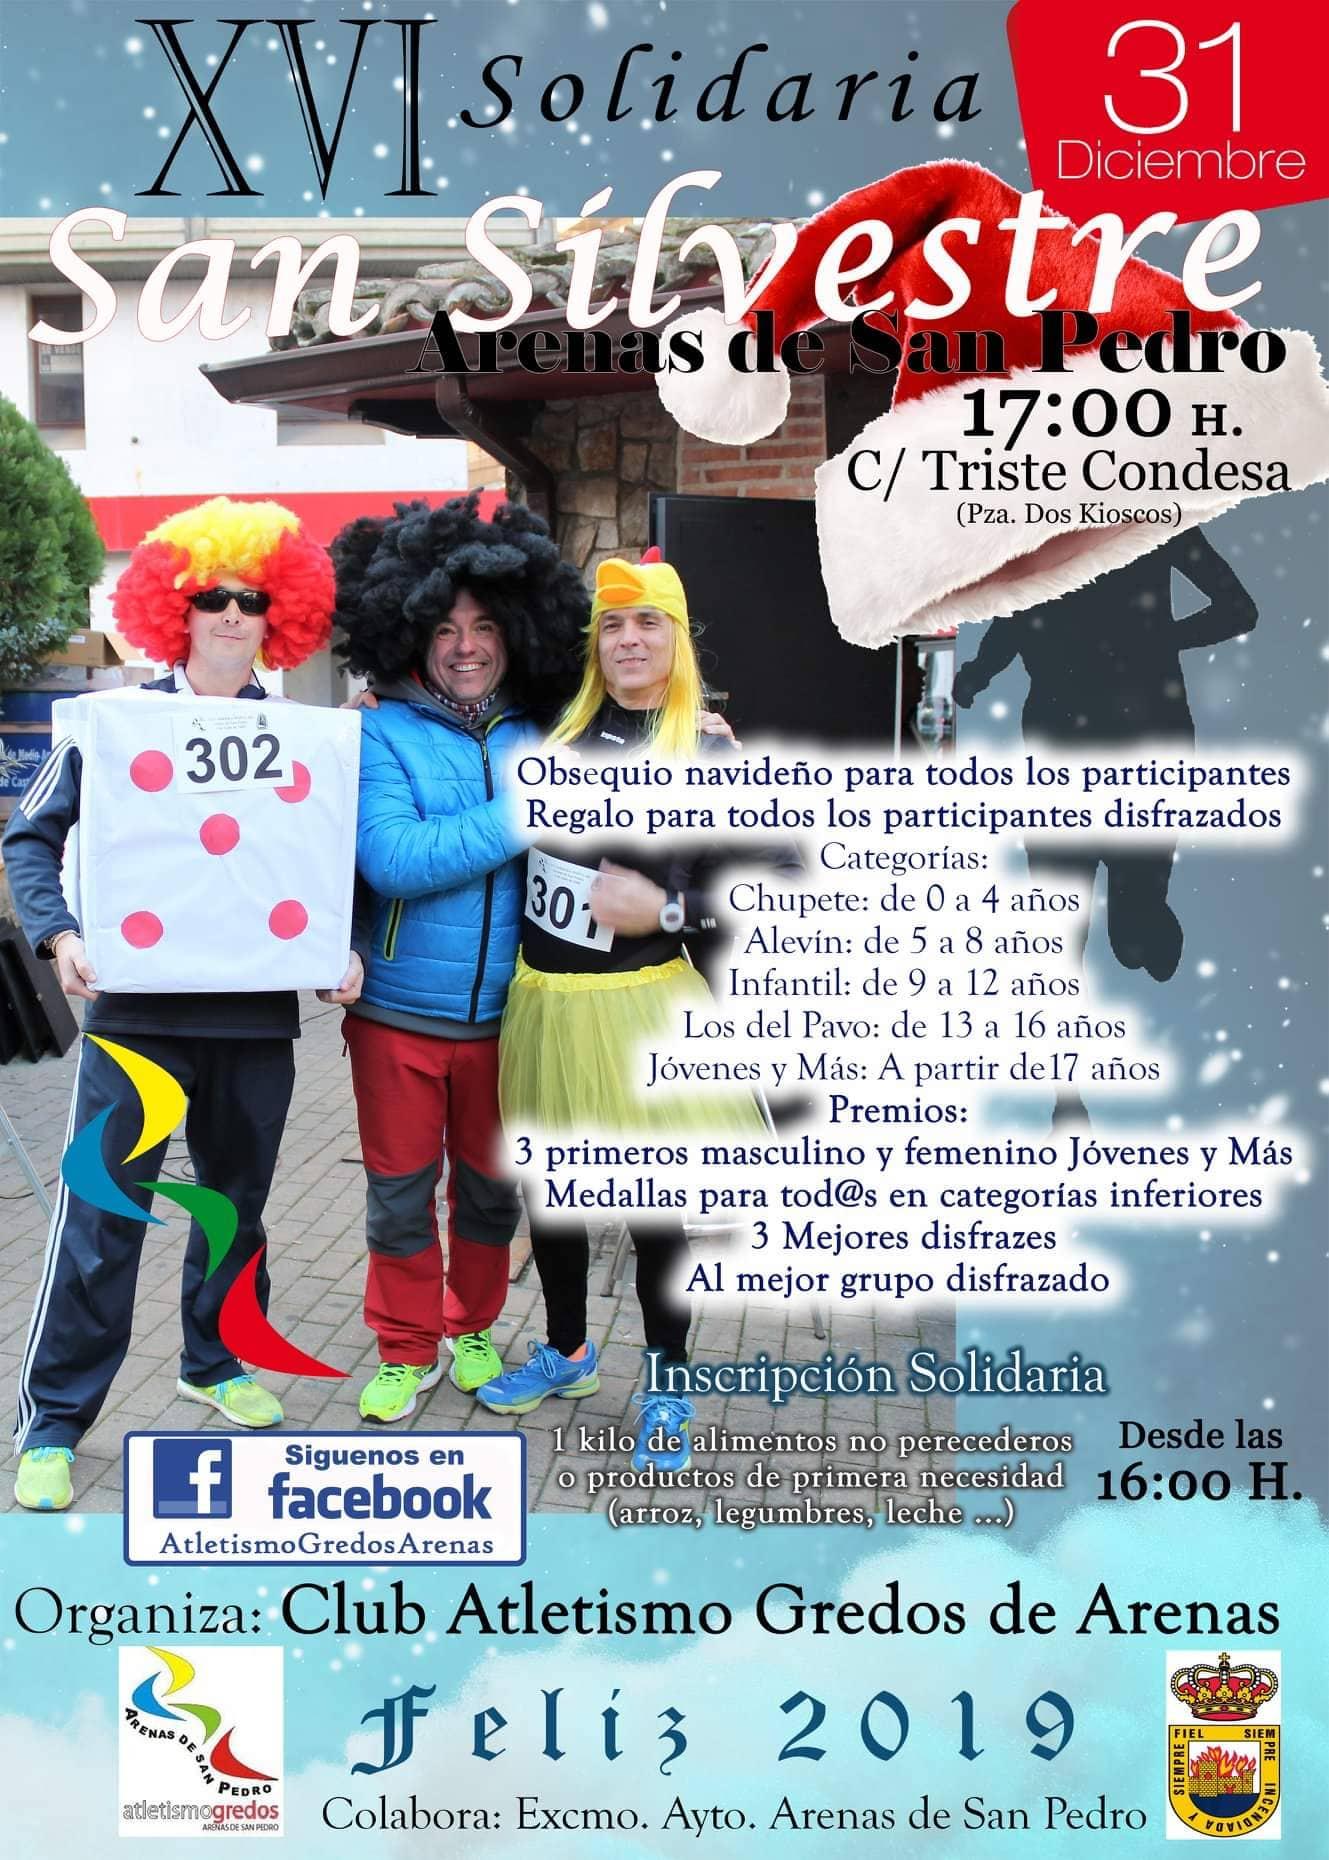 San Silvestre Arenense - Arenas de San Pedro - TiétarTeVe